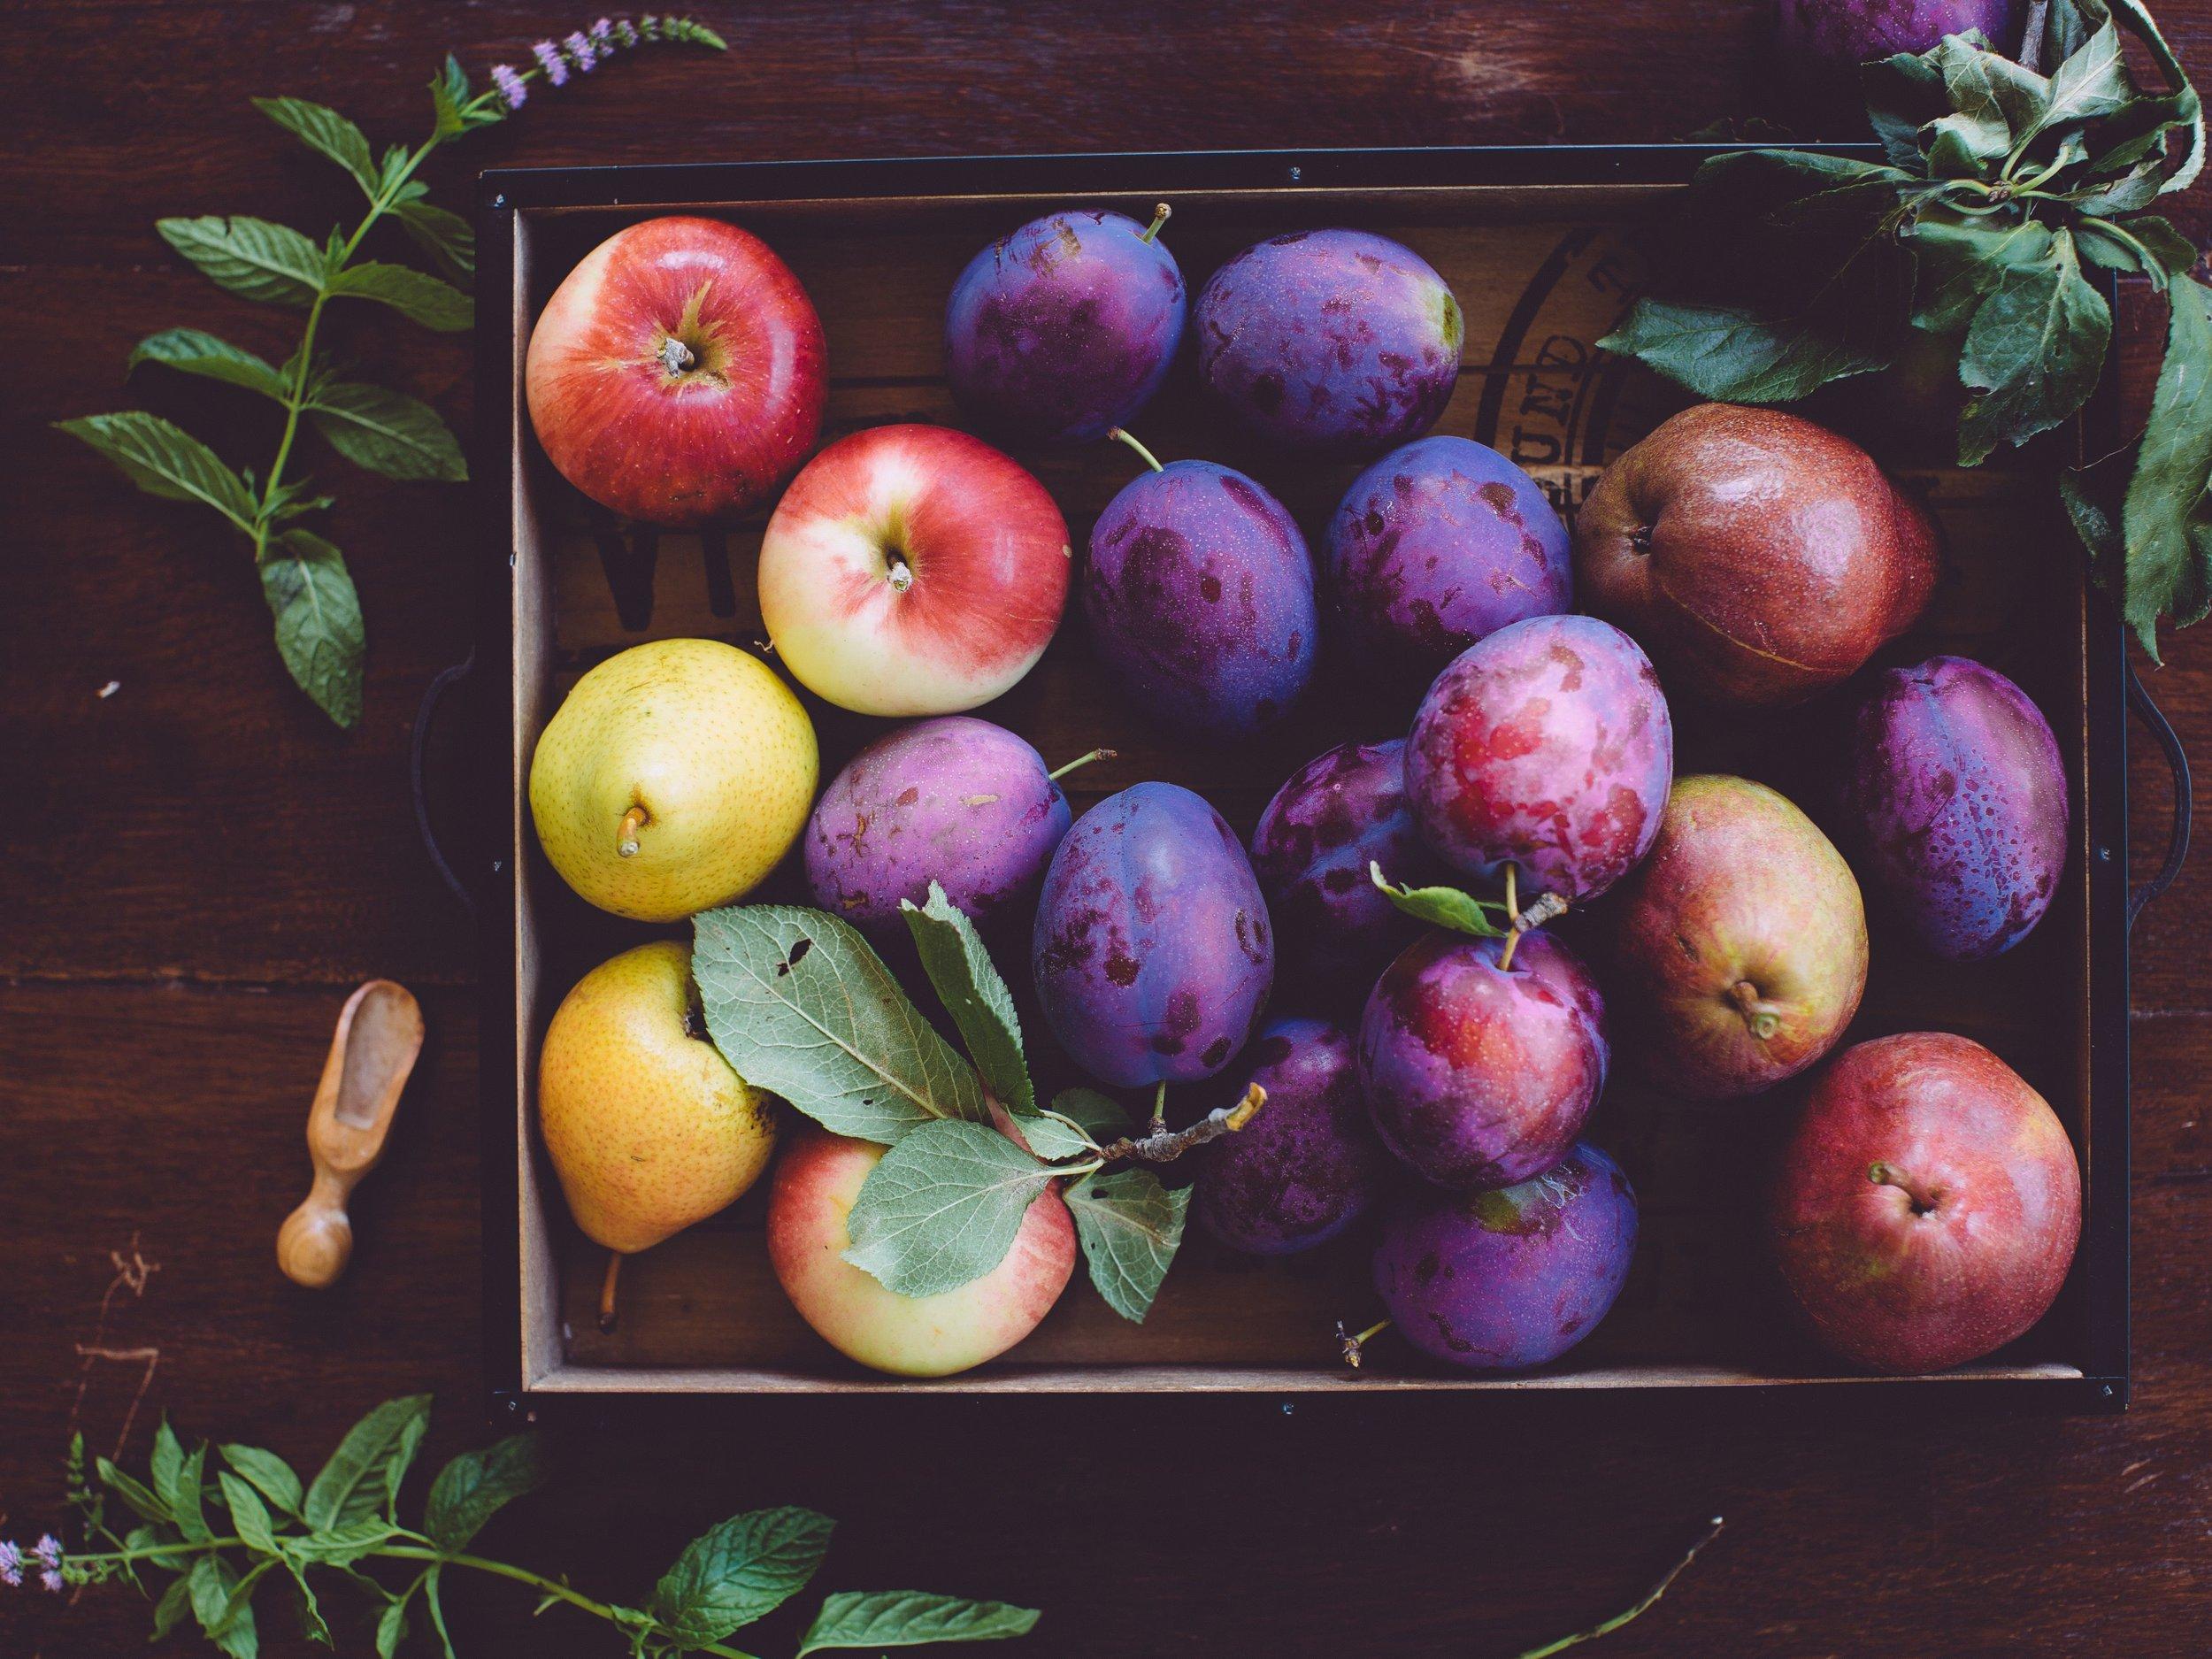 apples-plums-56a30c7a3df78cf7727b9a85.jpg